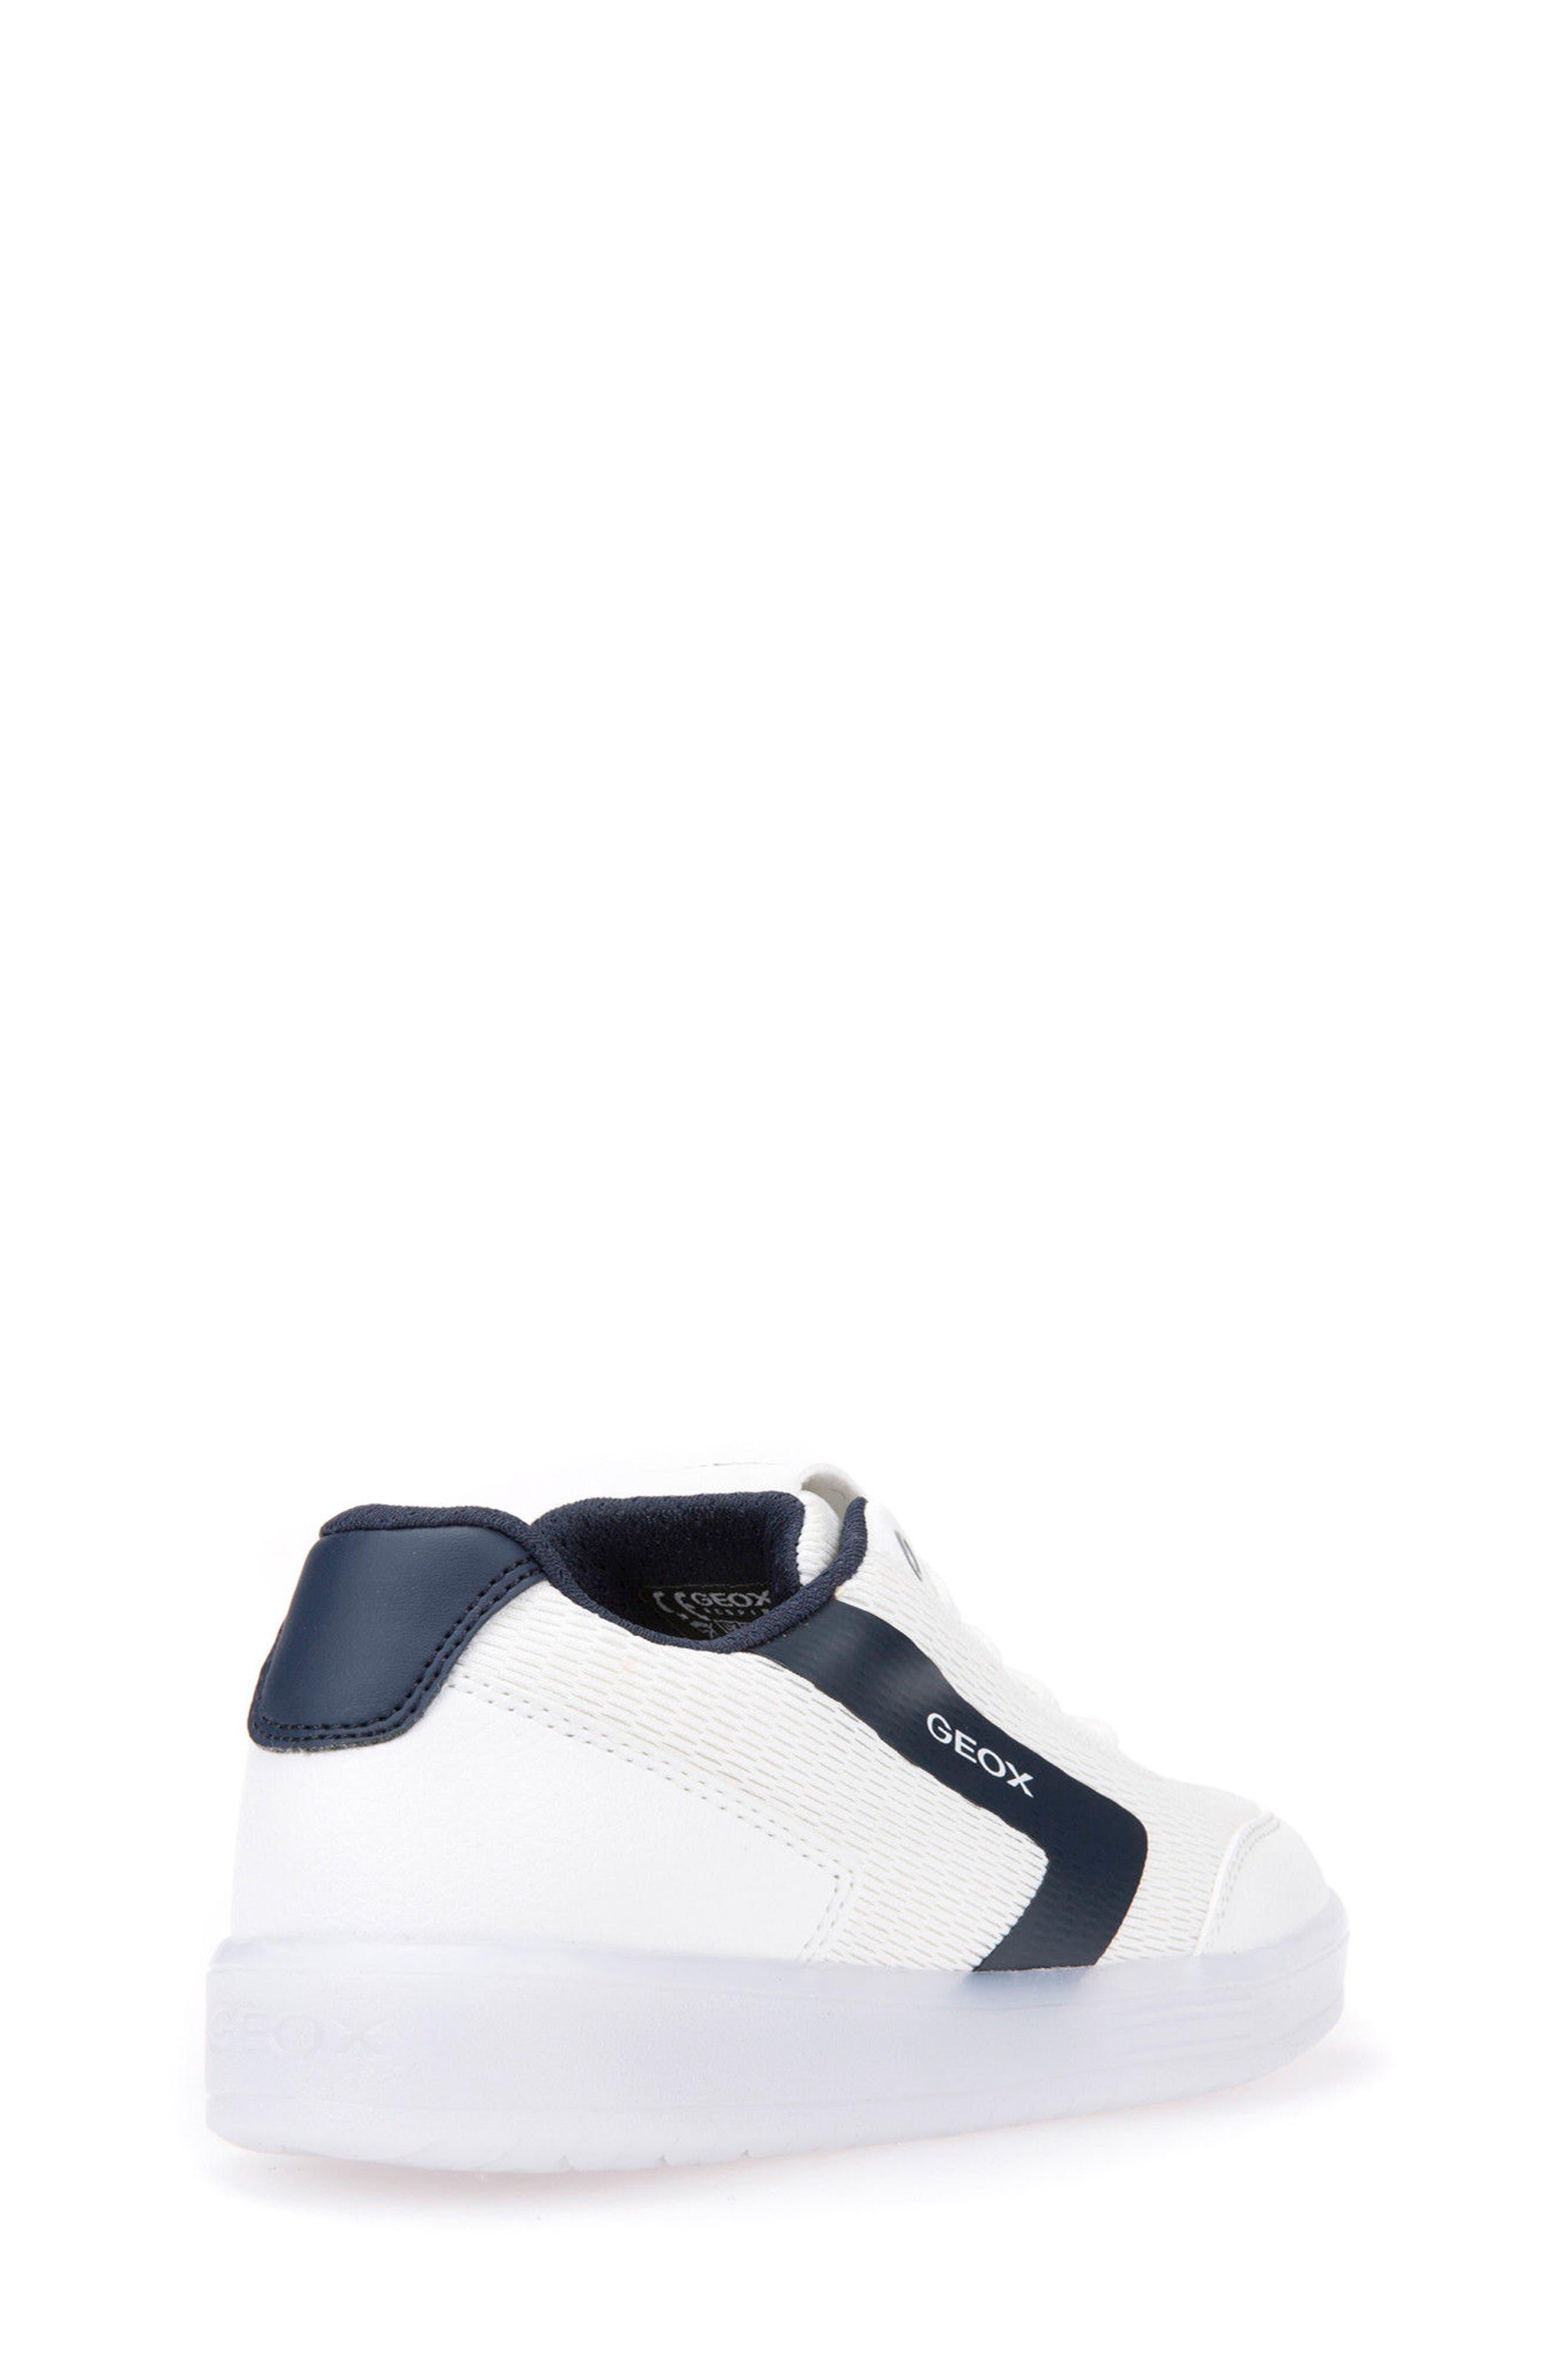 Kommodor Light-Up Low Top Sneaker,                             Alternate thumbnail 2, color,                             WHITE/ NAVY